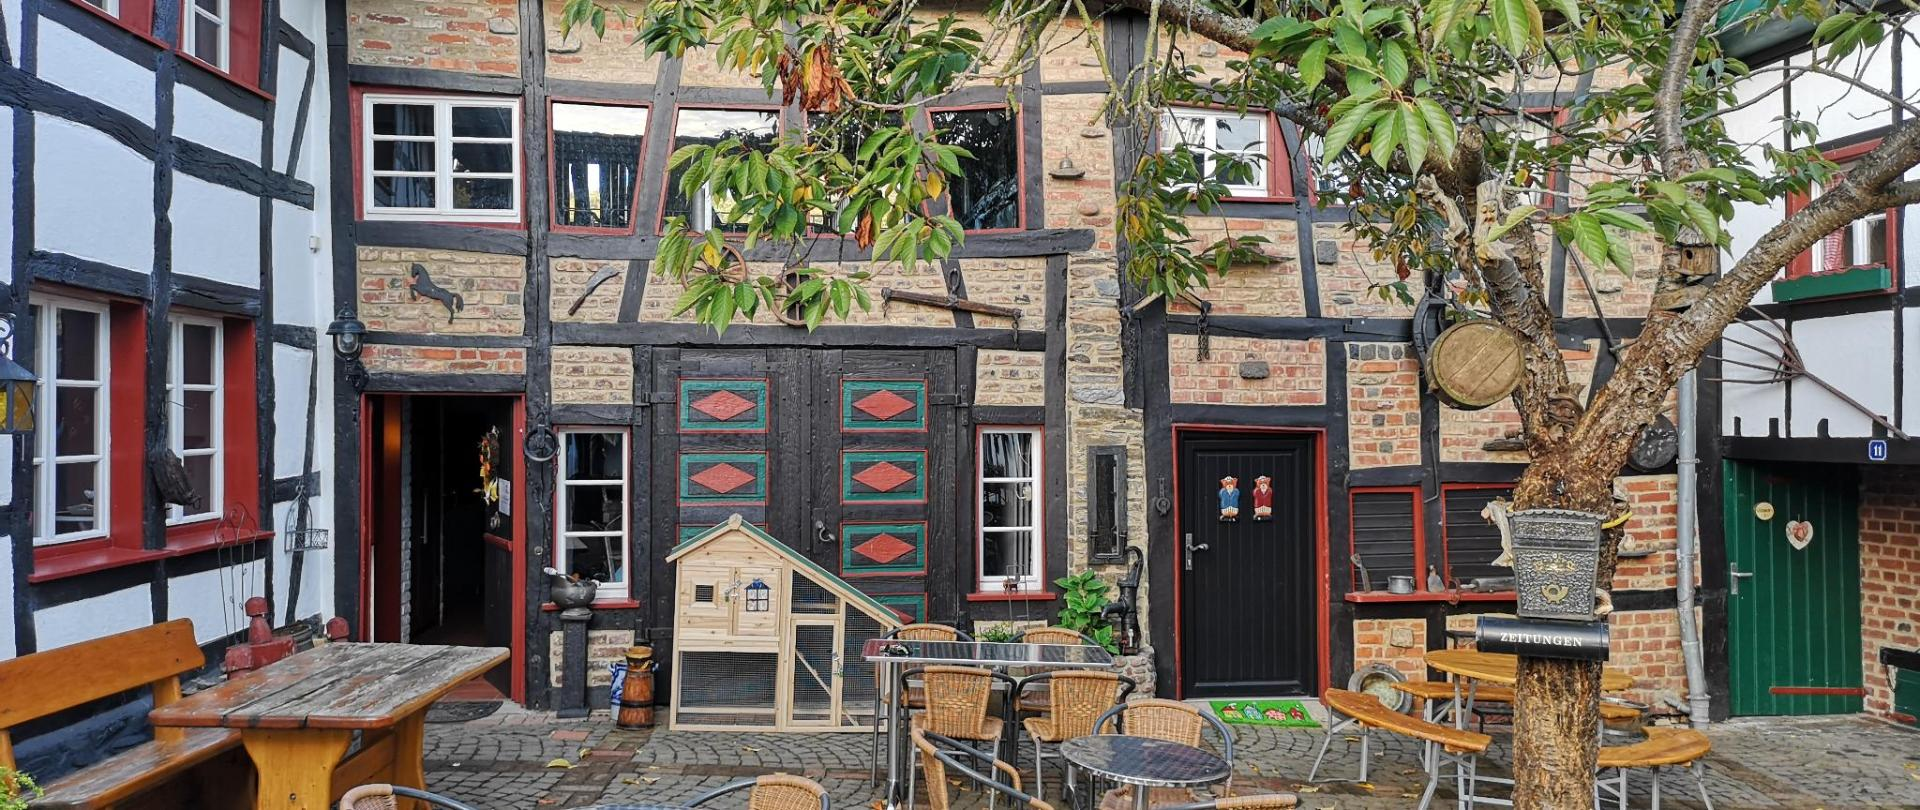 Ferienhof Schmickerath